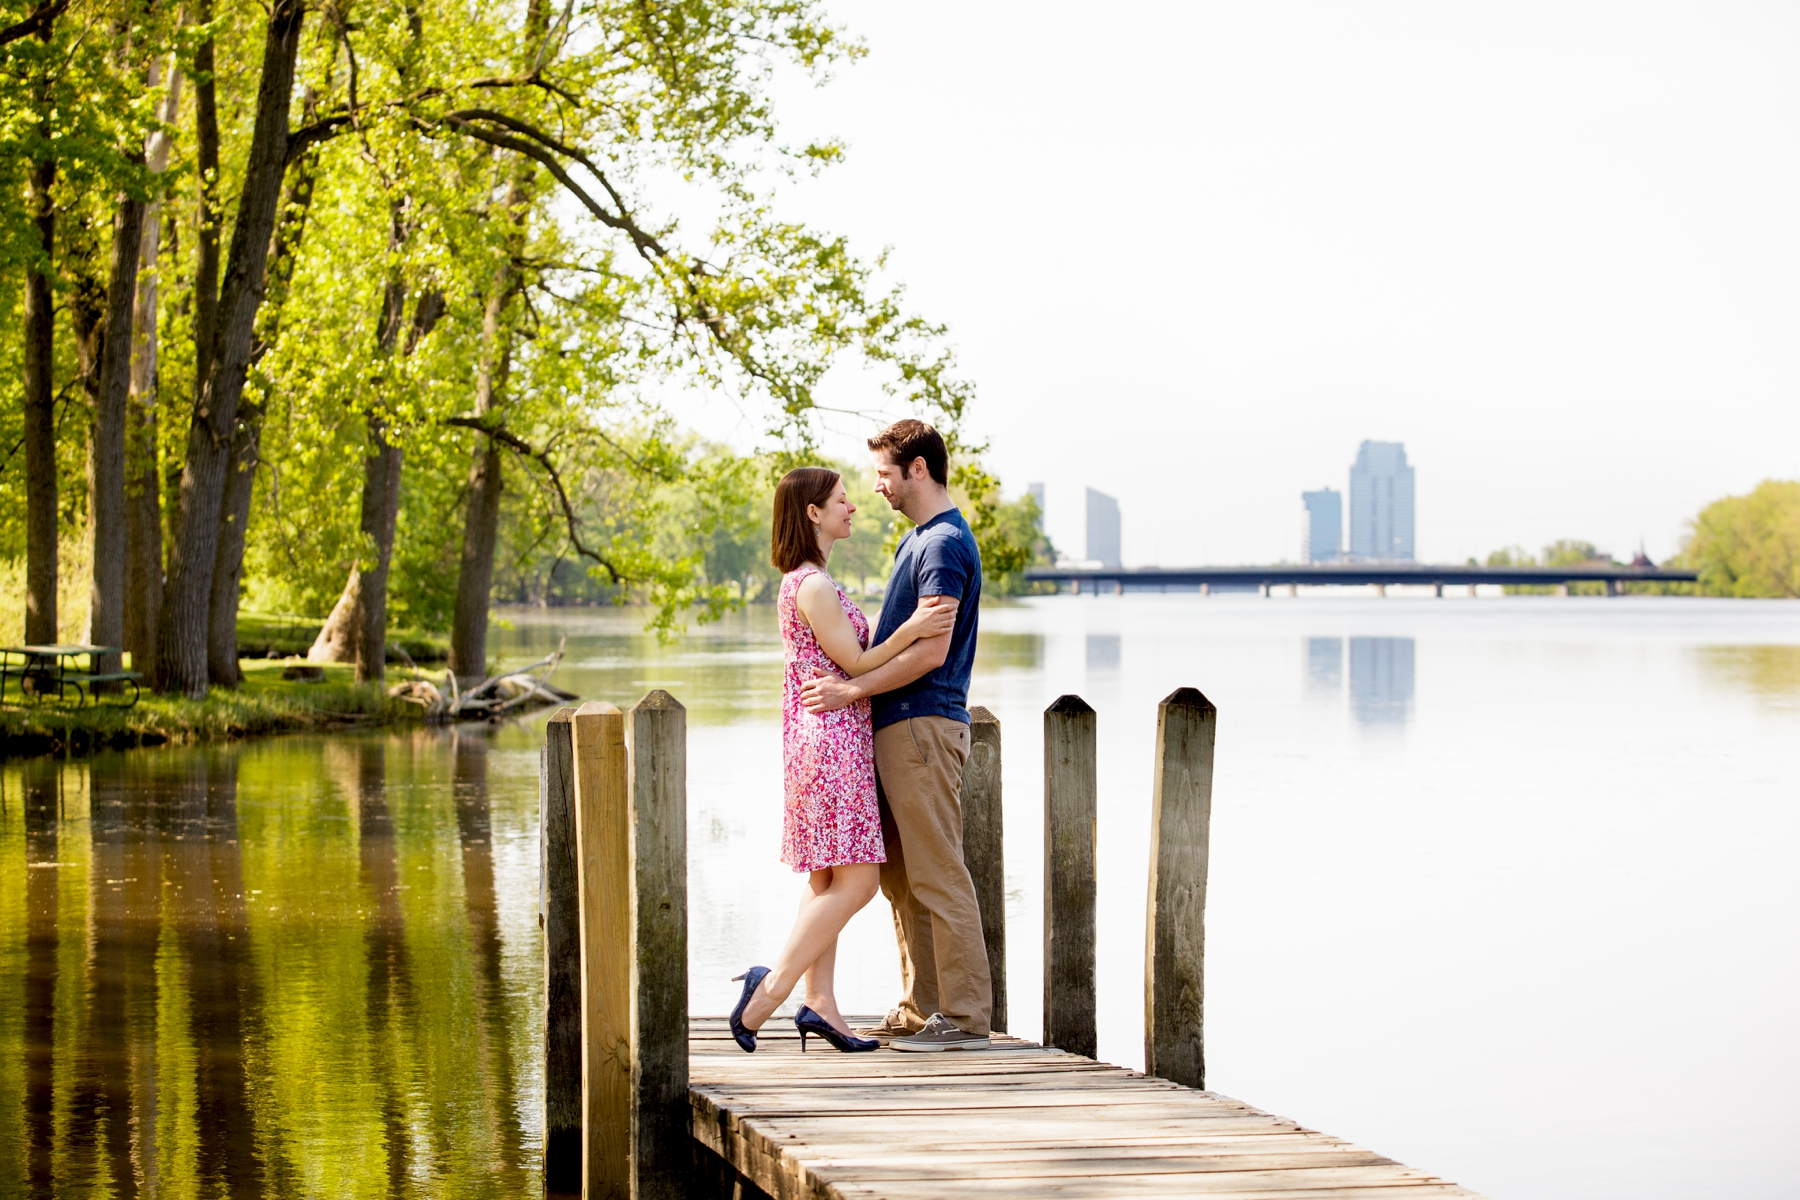 Brandon_Shafer_Photography_Michele_Chris_Michigan_Grand_Rapids_City_Engagement_0015.jpg